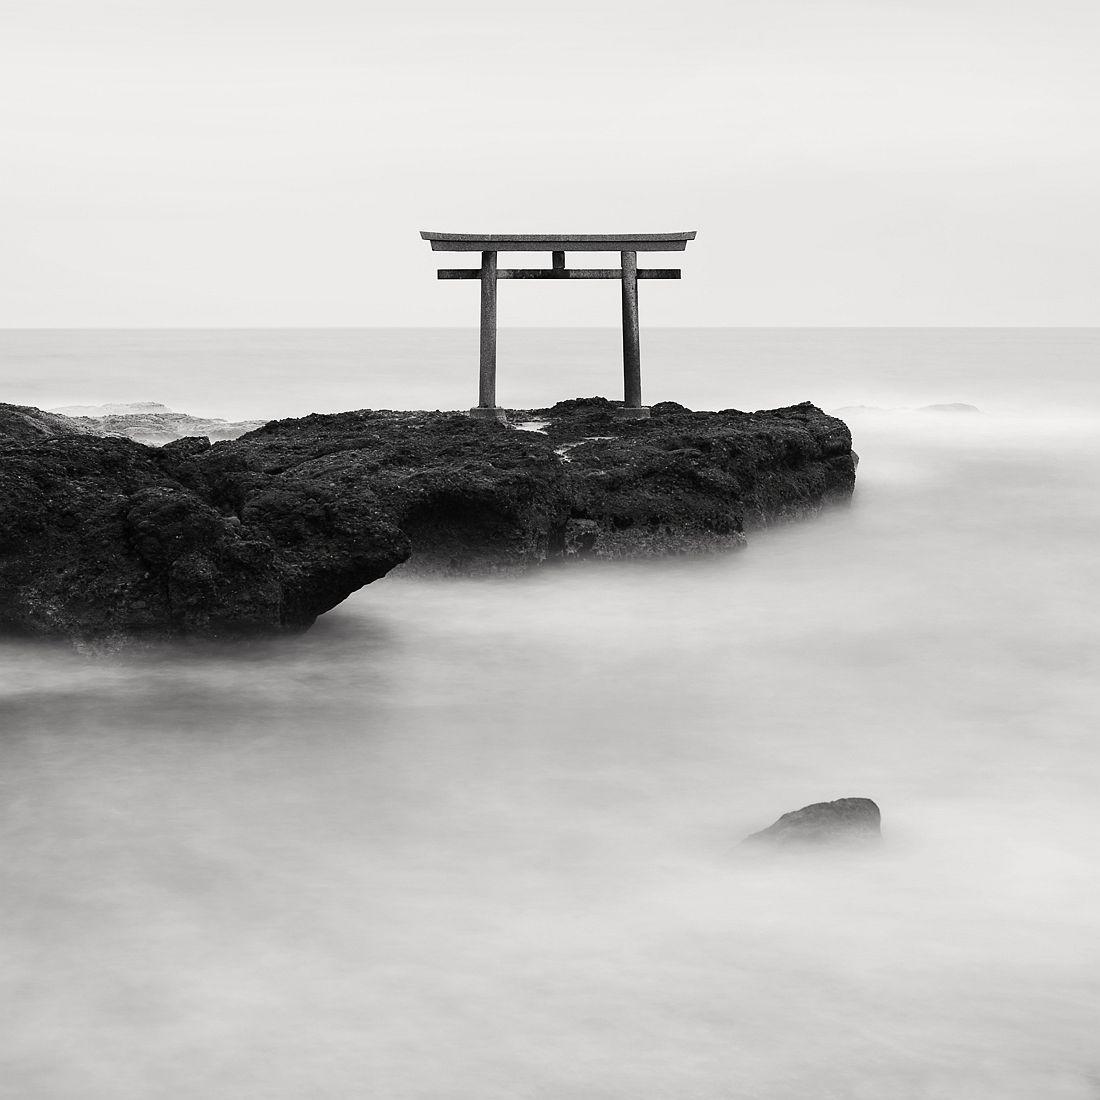 © Olivier Robert: Japan Coastlines / MonoVisions Awards 2017 winner